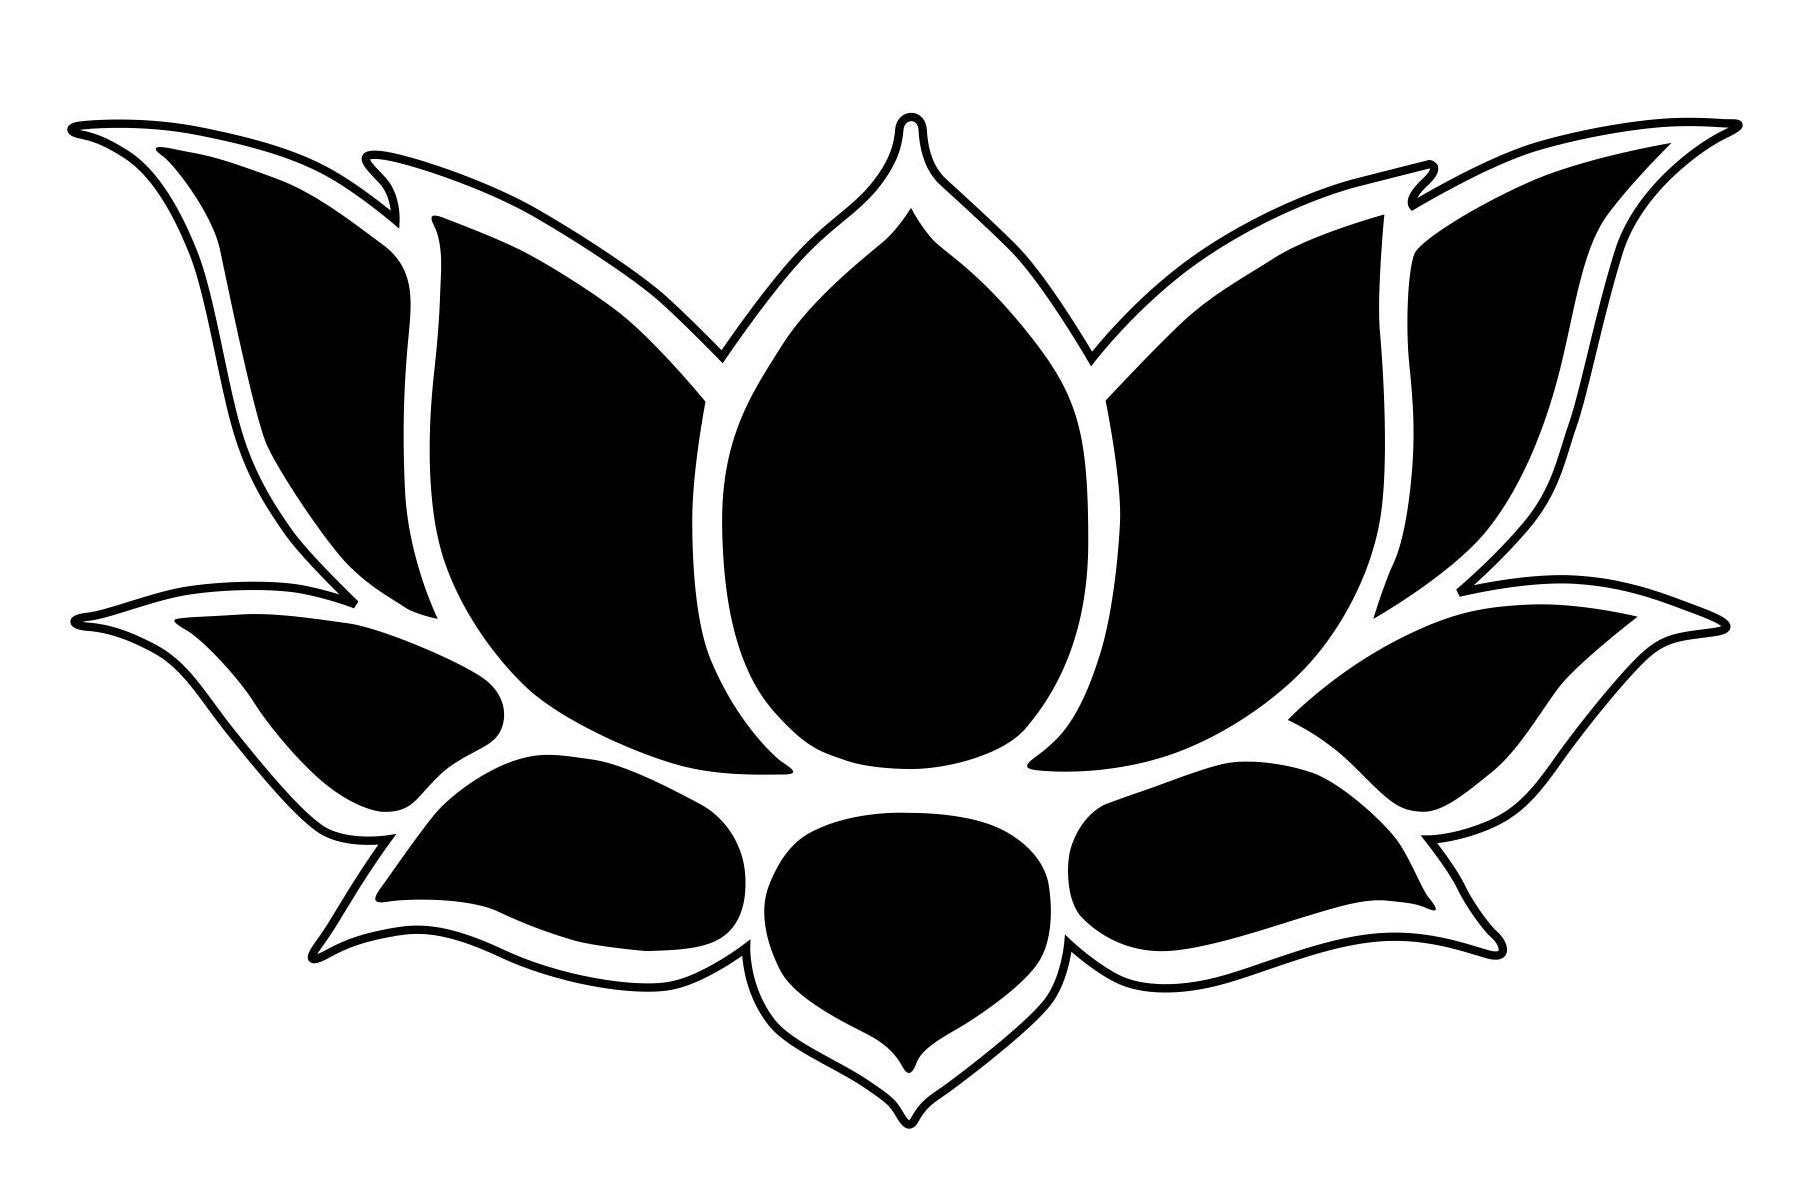 Free Flower Stencil Outline Download